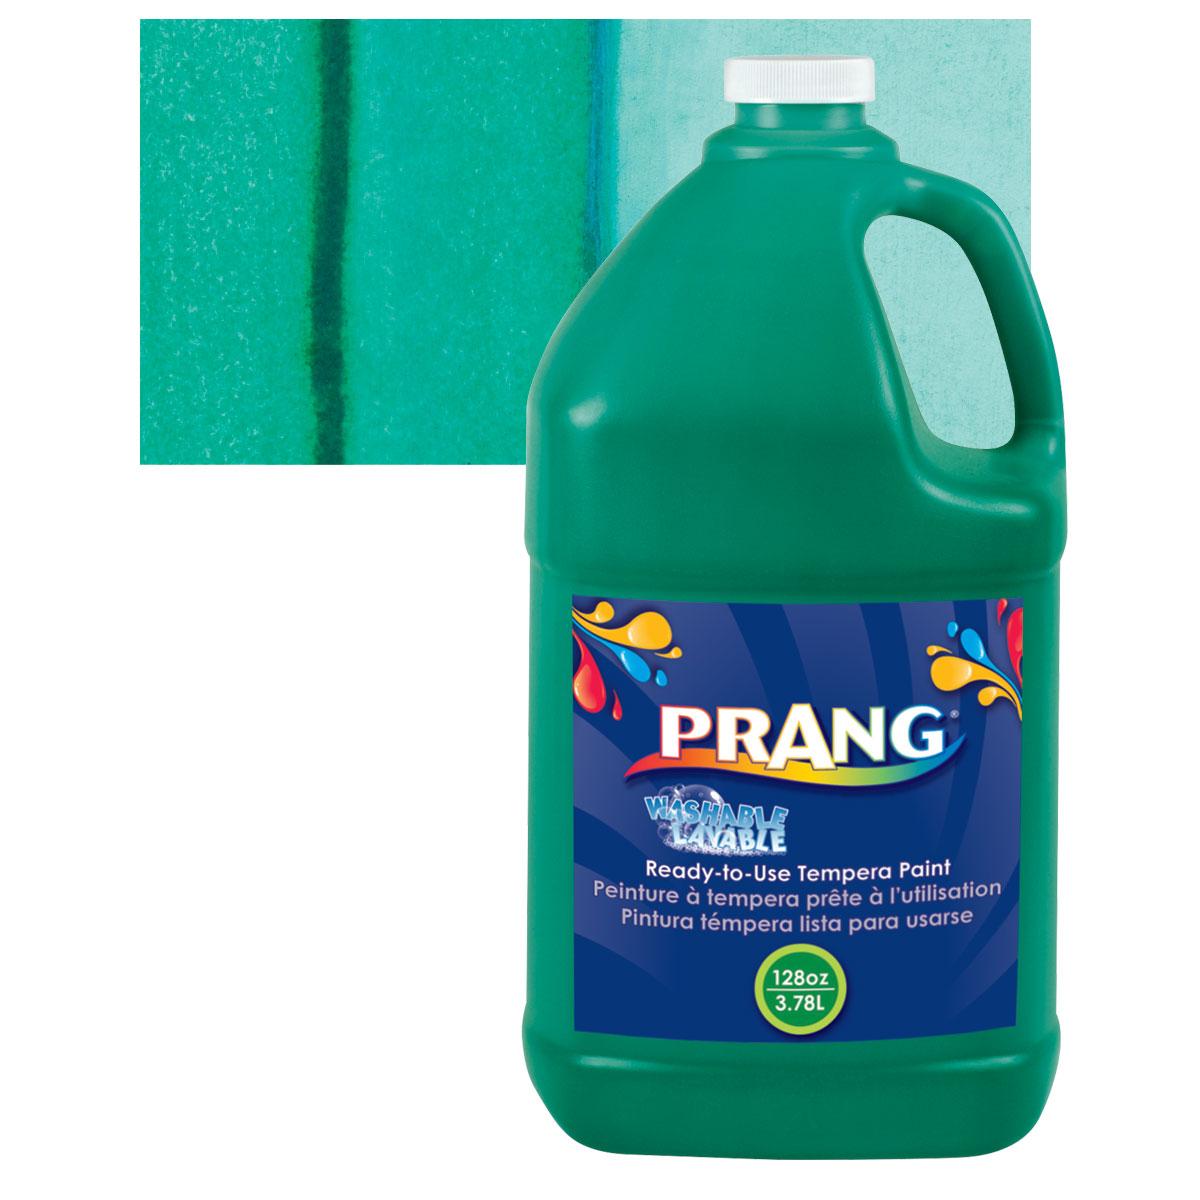 Prang Ready-To-Use Washable Tempera Paint - Green, Gallon